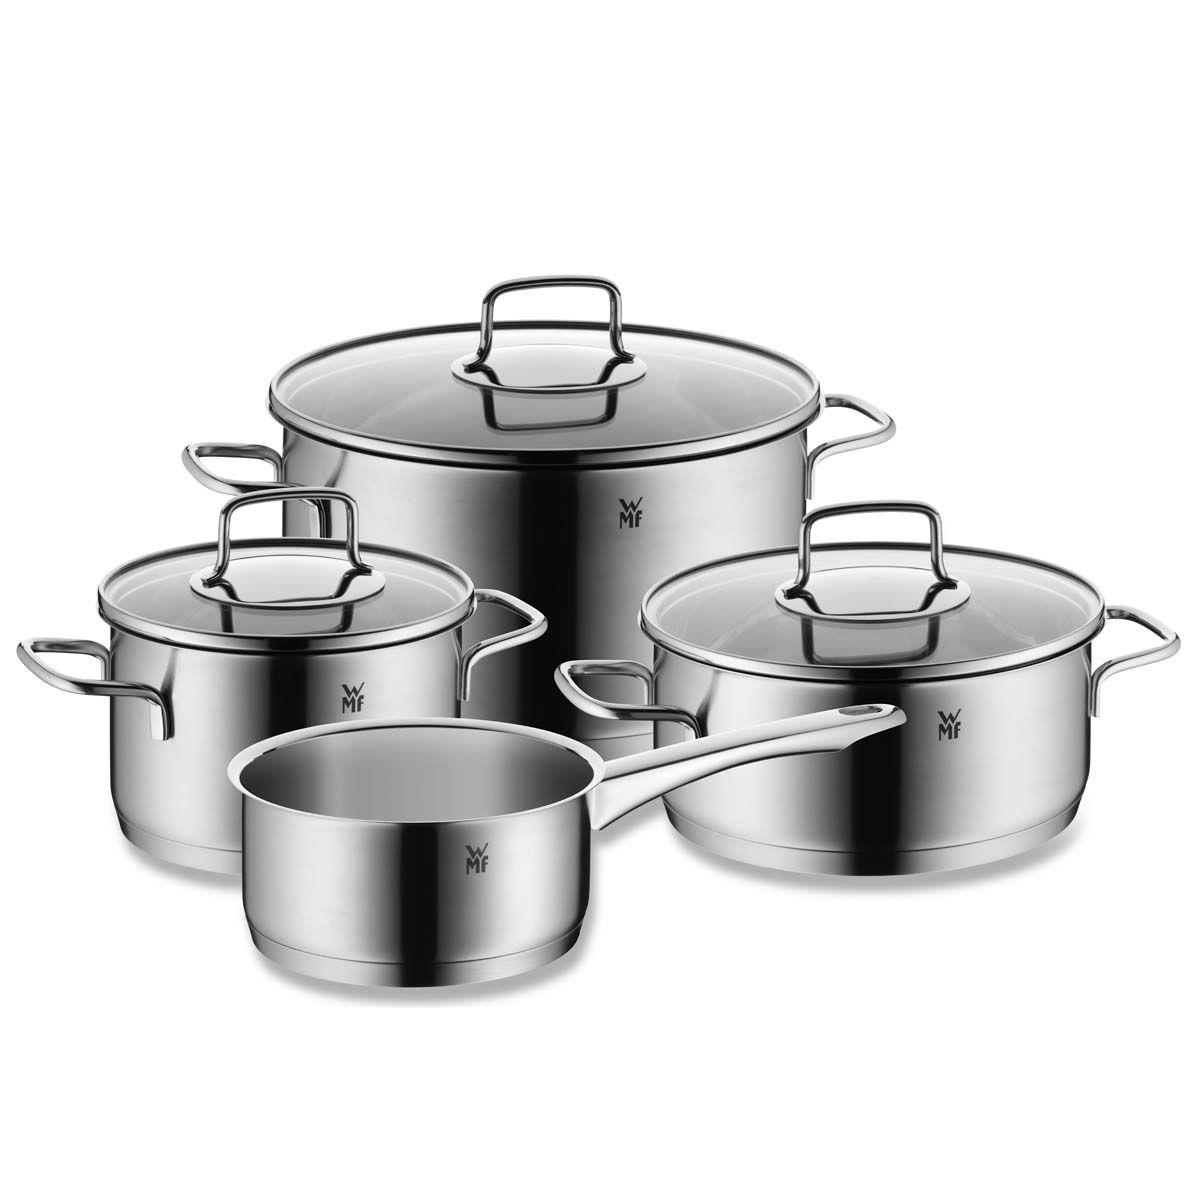 Онлайн каталог PROMENU: Набор кухонной посуды WMF MERANO, серебристый, 4 предмета WMF 07 8024 6330